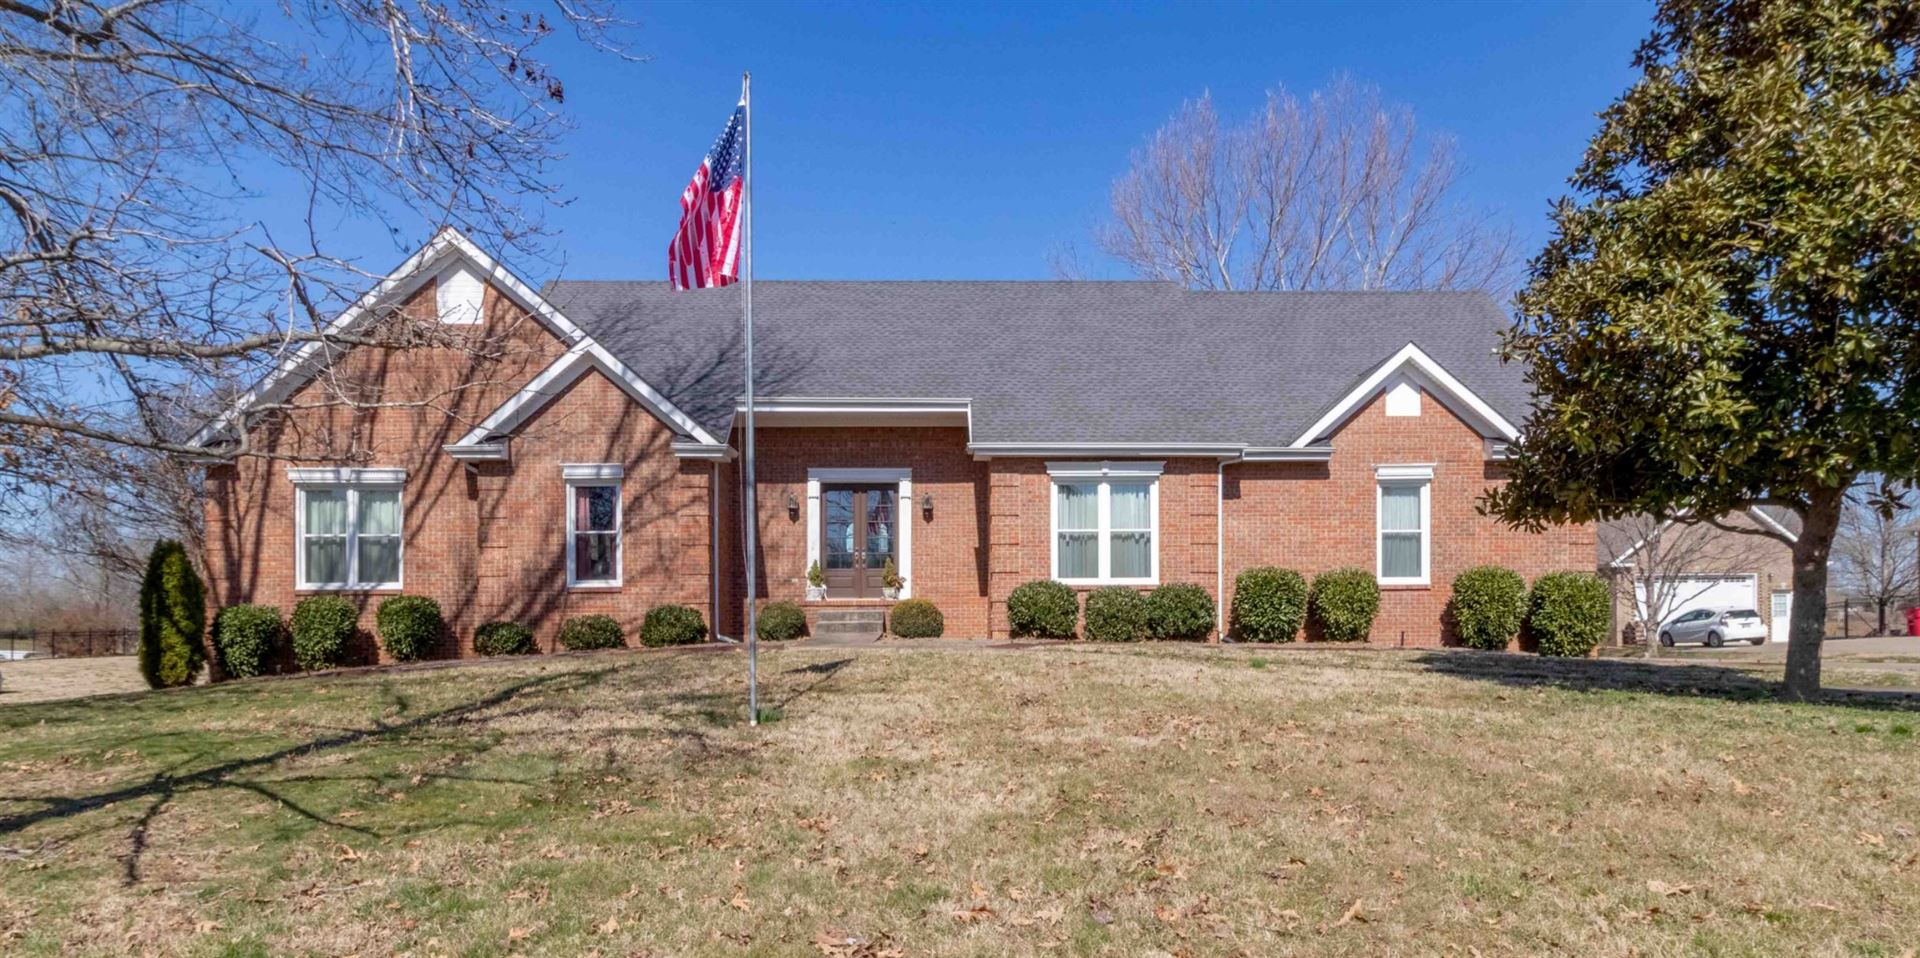 414 Savannah Trace Dr, Clarksville, TN 37043 - MLS#: 2233181